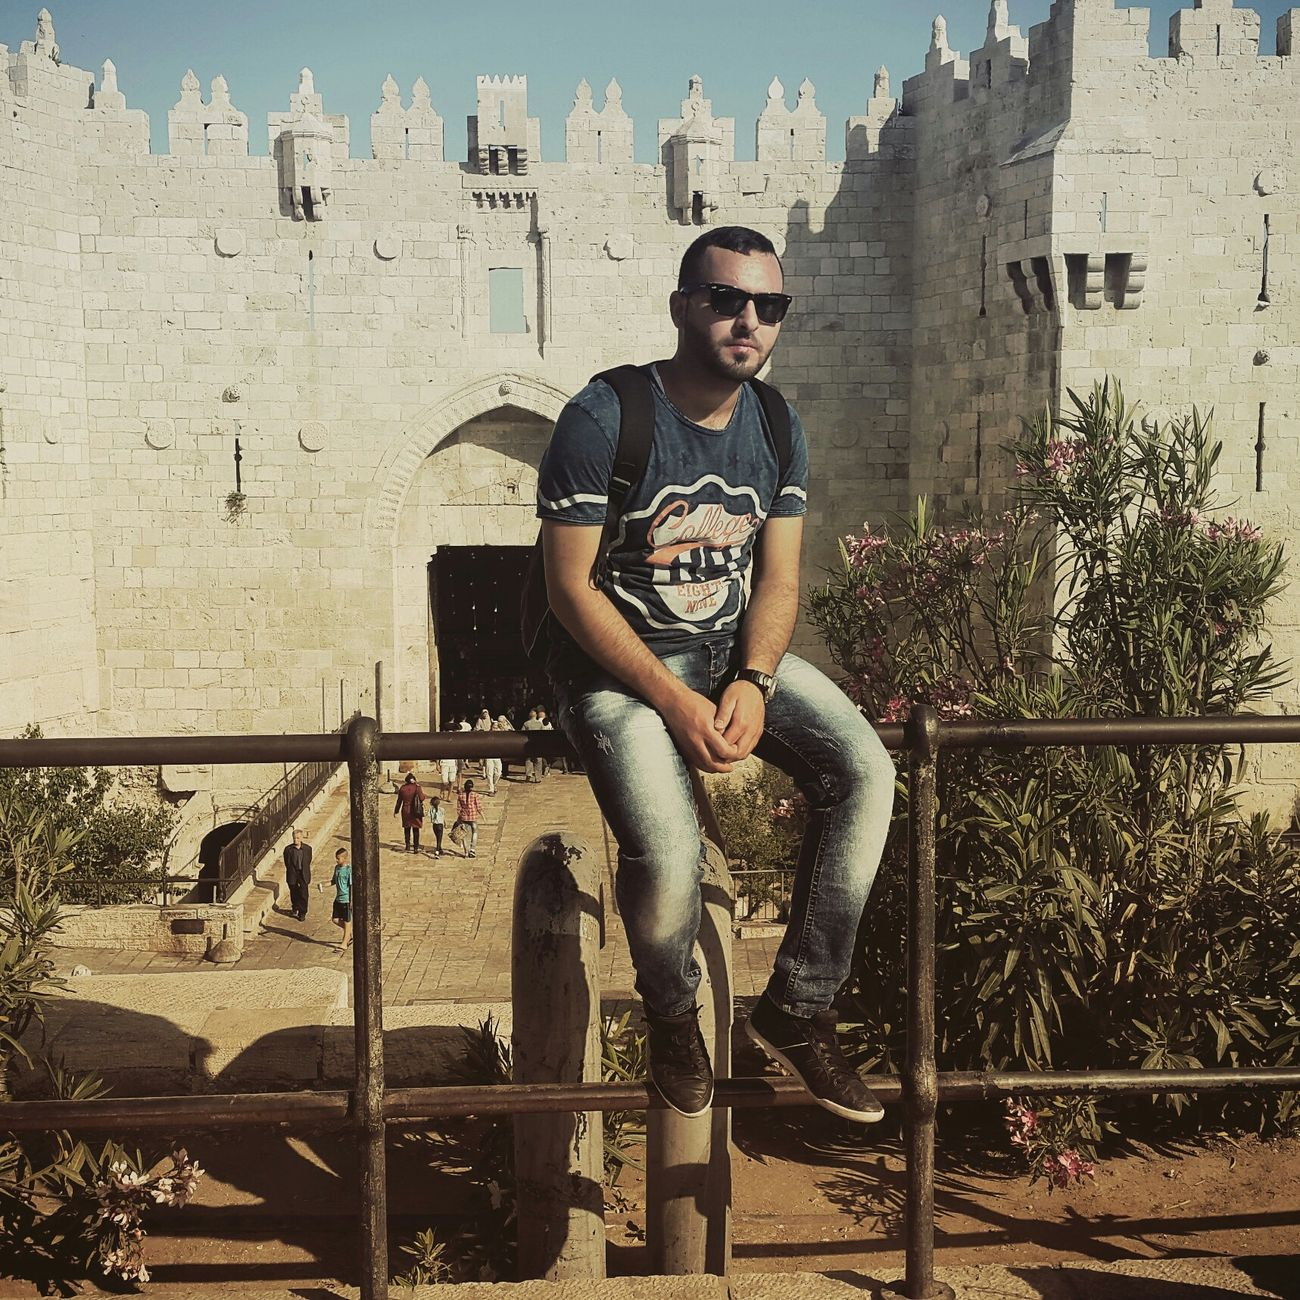 Deya ( Me Taking Photos Hanging Out Have A Nice Day! Jerusalem باب العمود القدس من في القدس الا انت !!! Palestine القدس EyeEm )